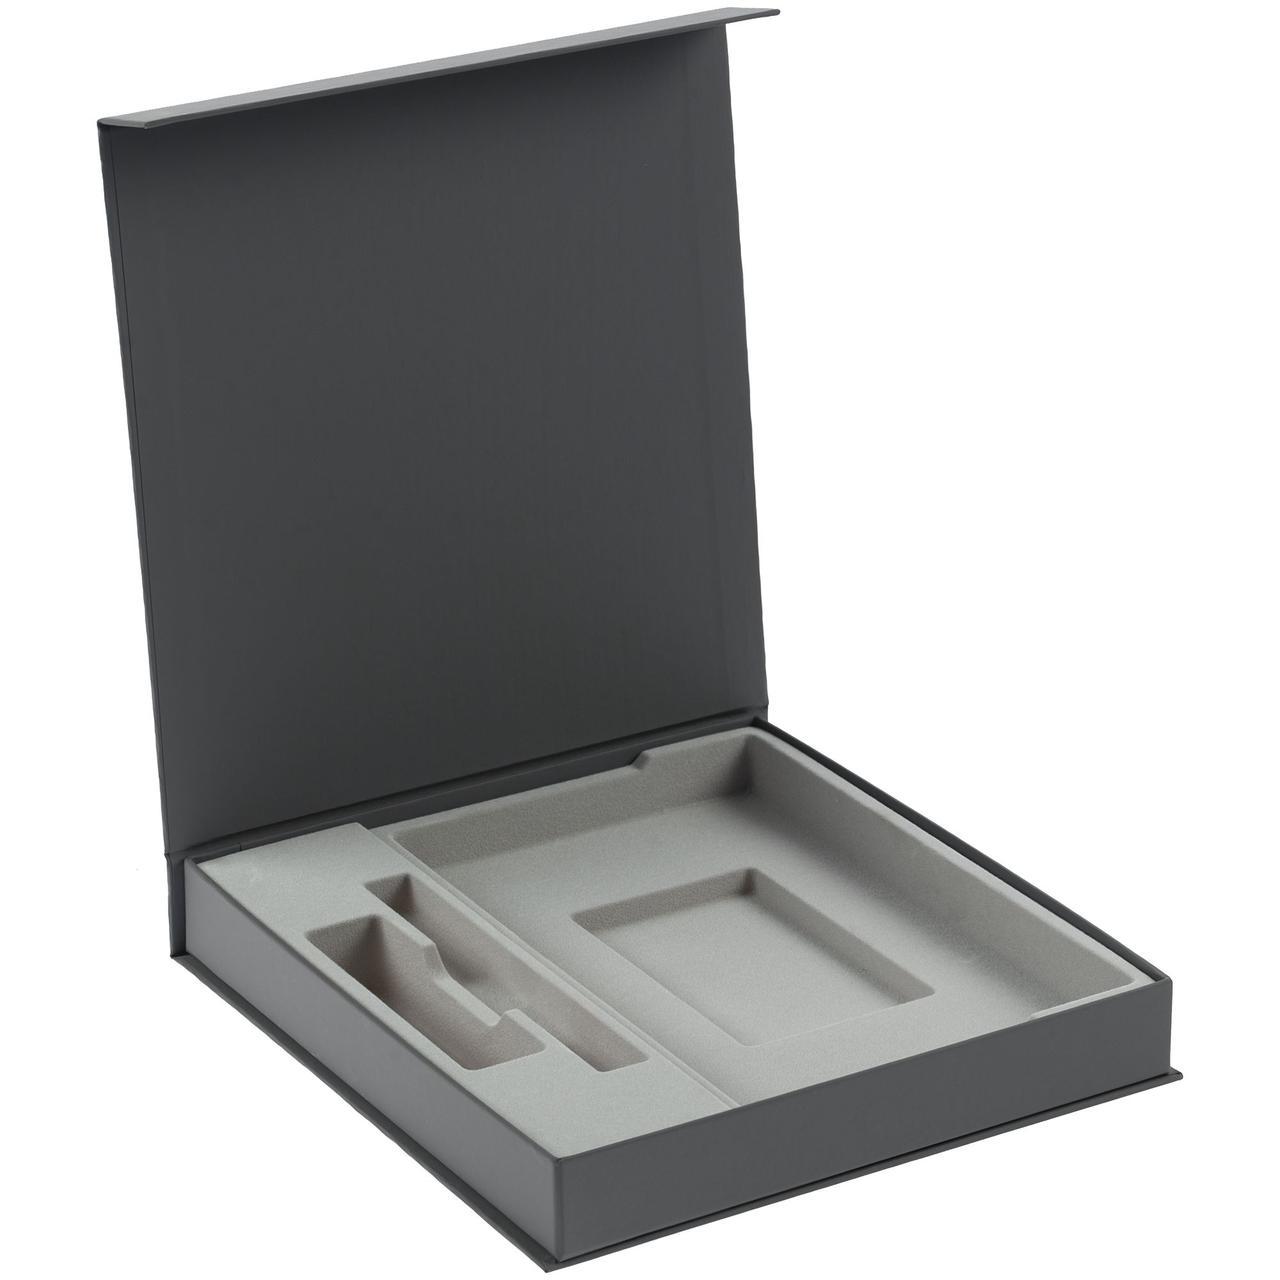 Коробка Arbor под ежедневник 13х21 см, аккумулятор и ручку, серая (артикул 11703.10)